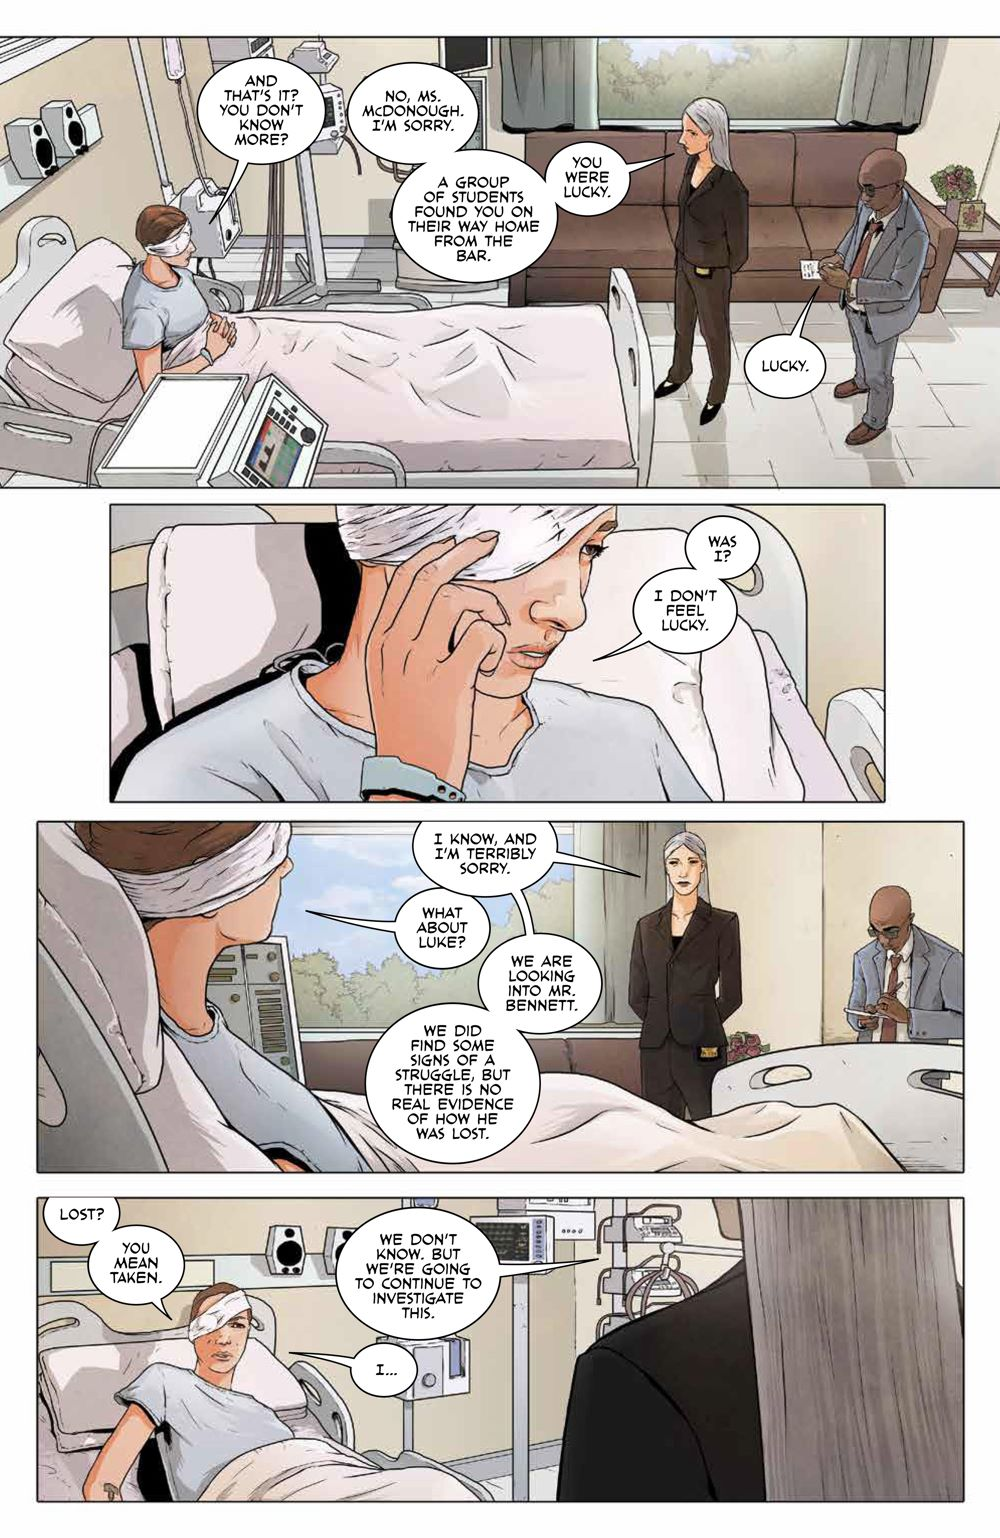 RedMother_v1_SC_PRESS_17 ComicList Previews: RED MOTHER VOLUME 1 TP